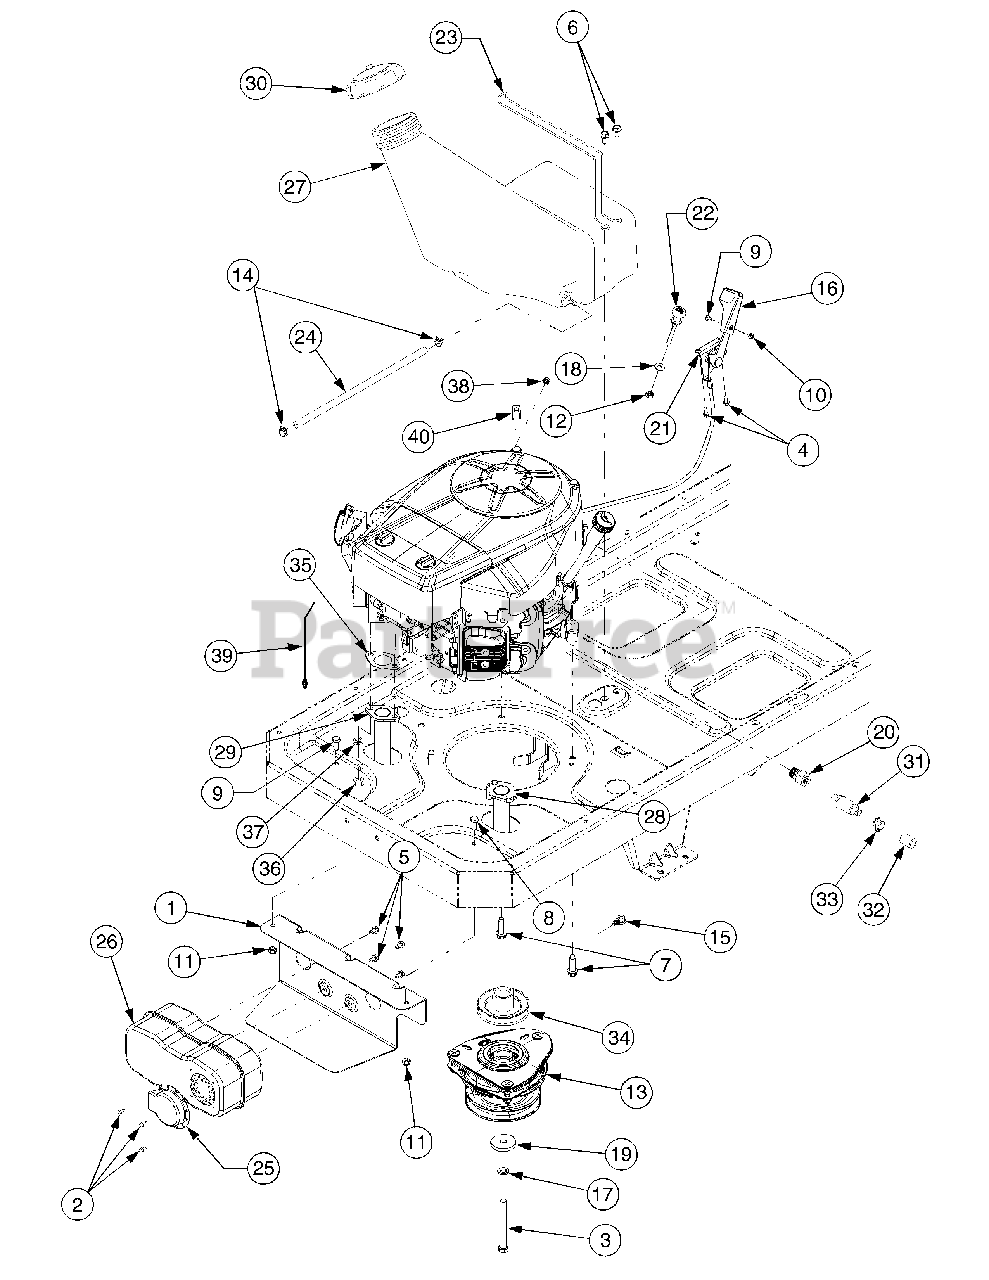 Cub Cadet Parts on the Engine Accessories Kawasaki Diagram